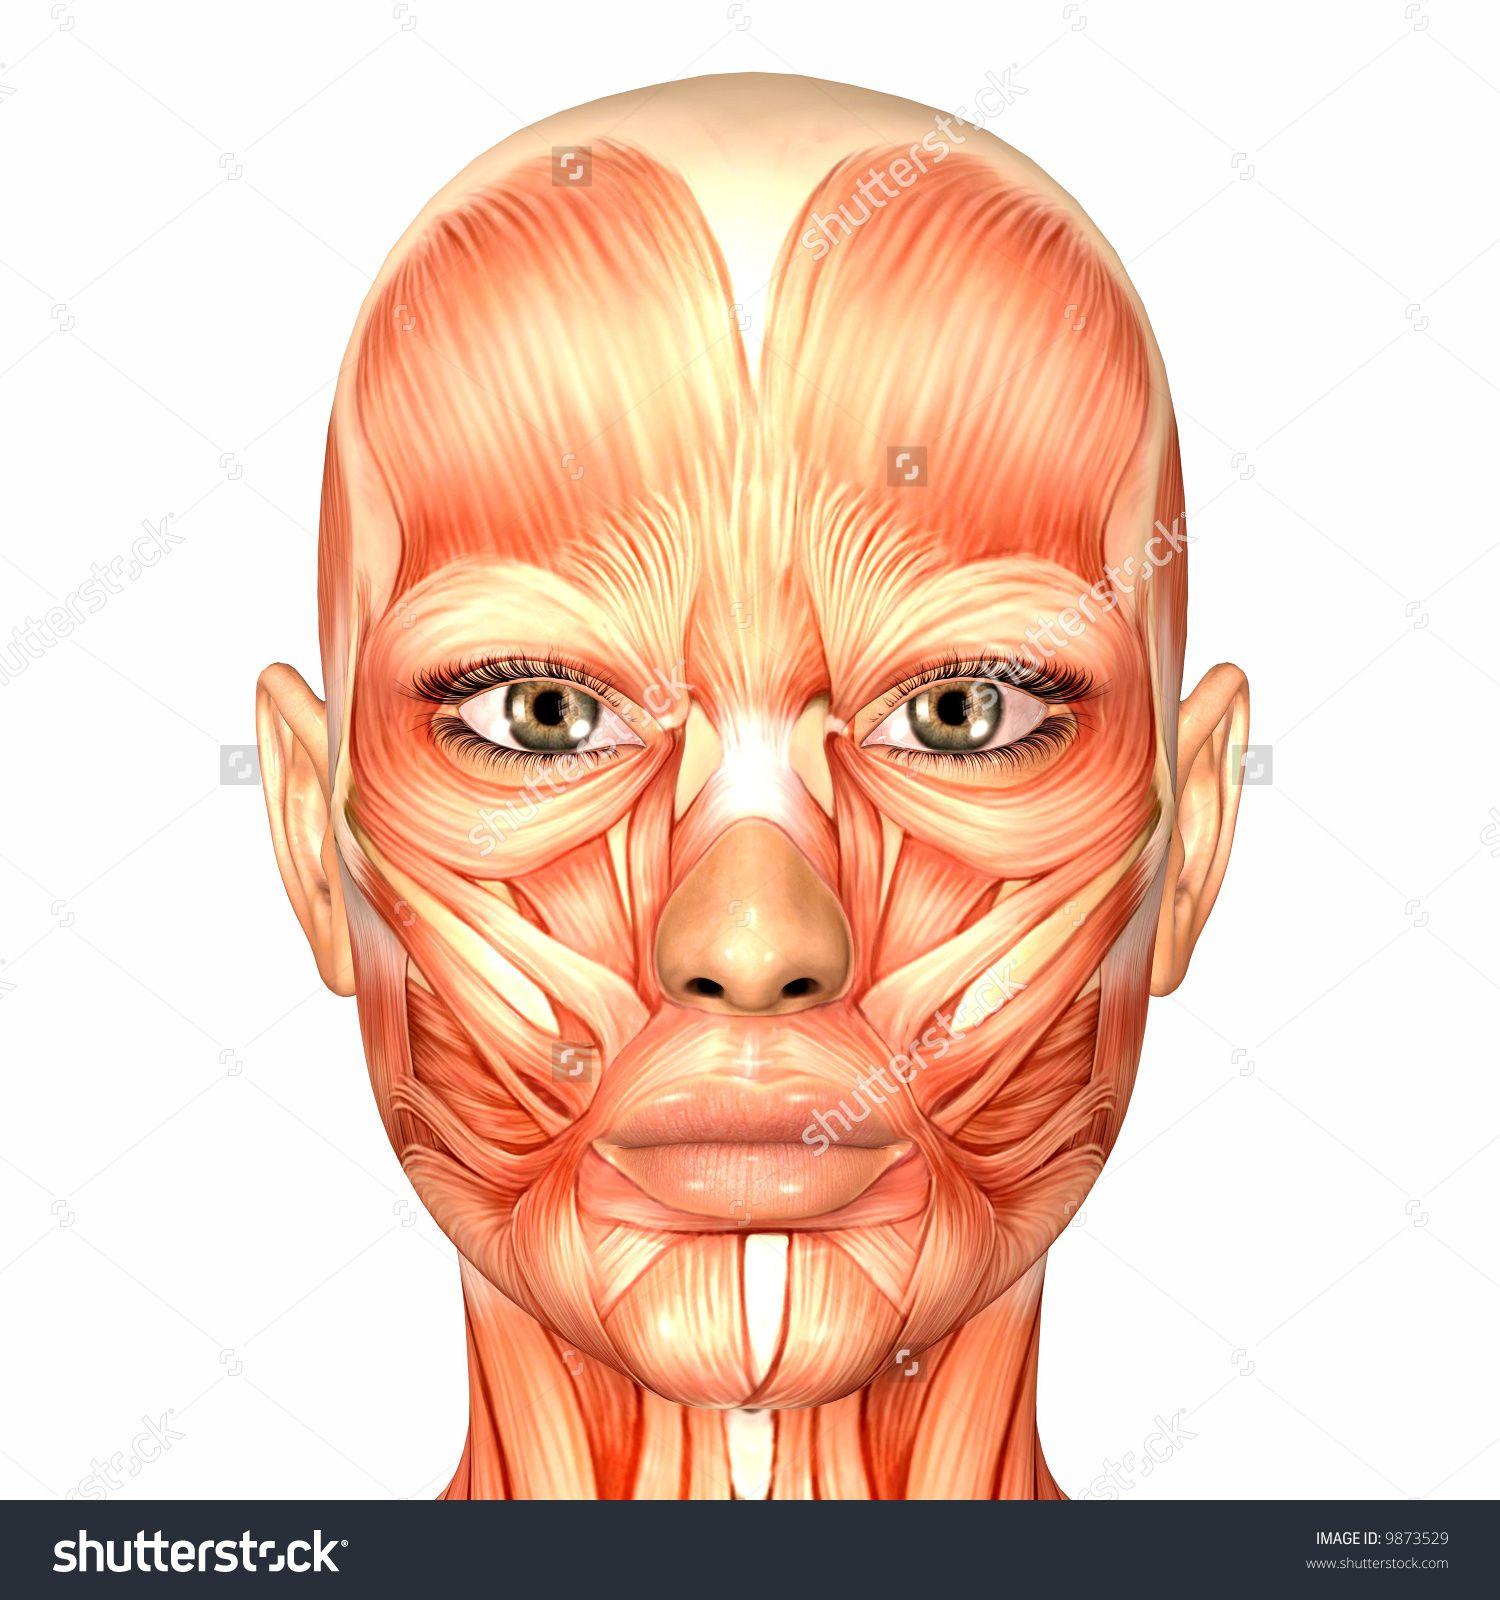 Imageutterstock Z Stock Photo Human Anatomy